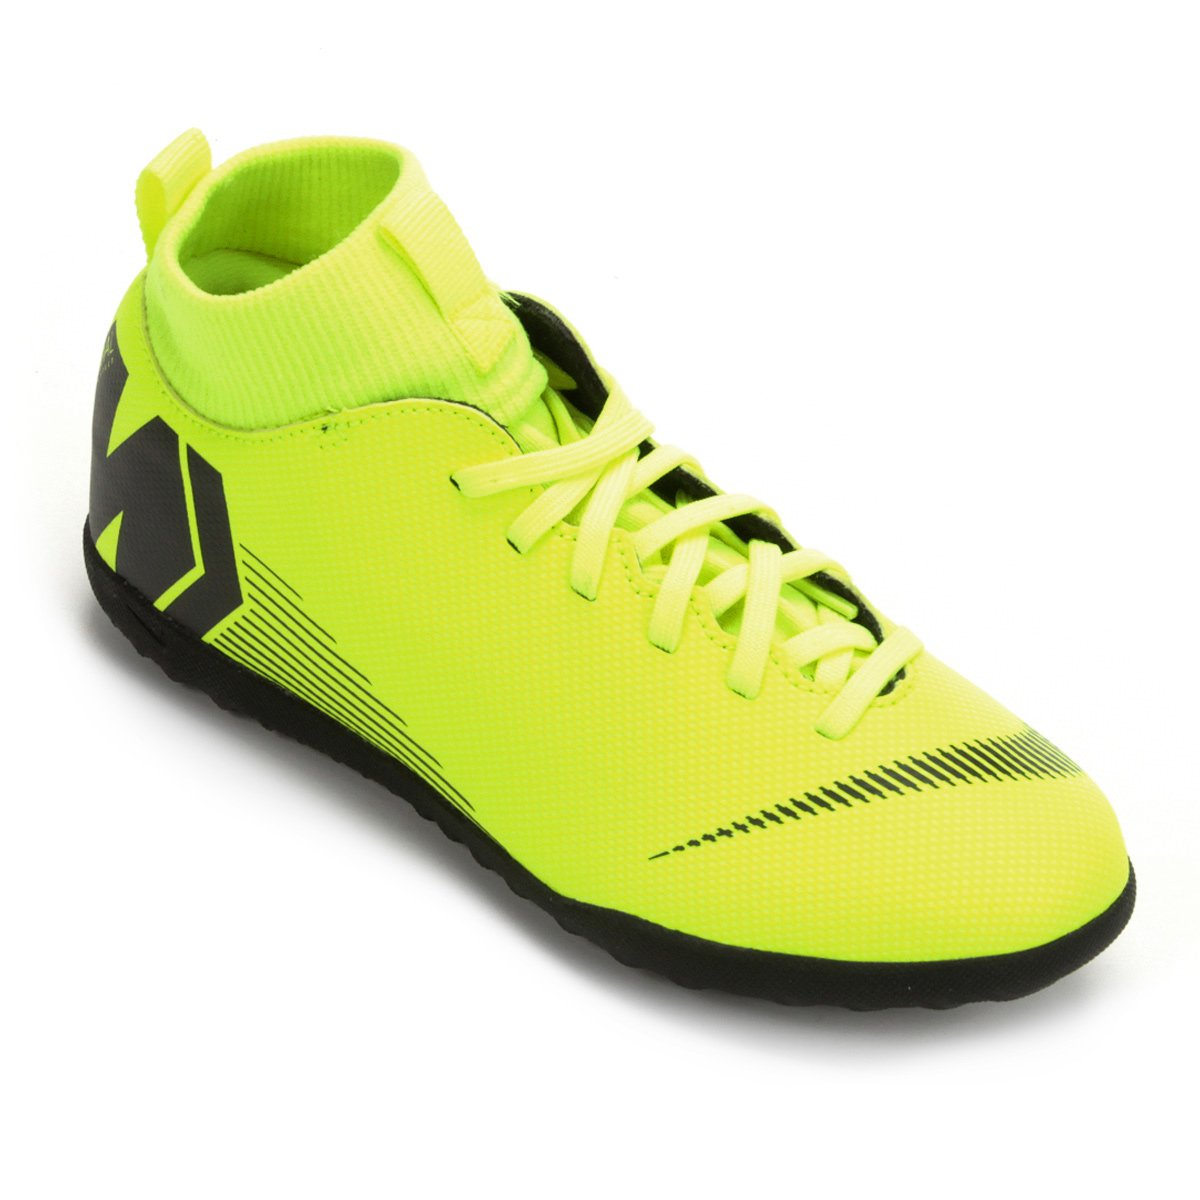 d8d10bd2fa57f Chuteira Society Infantil Nike Mercurial Superfly 6 Club | Shop Timão